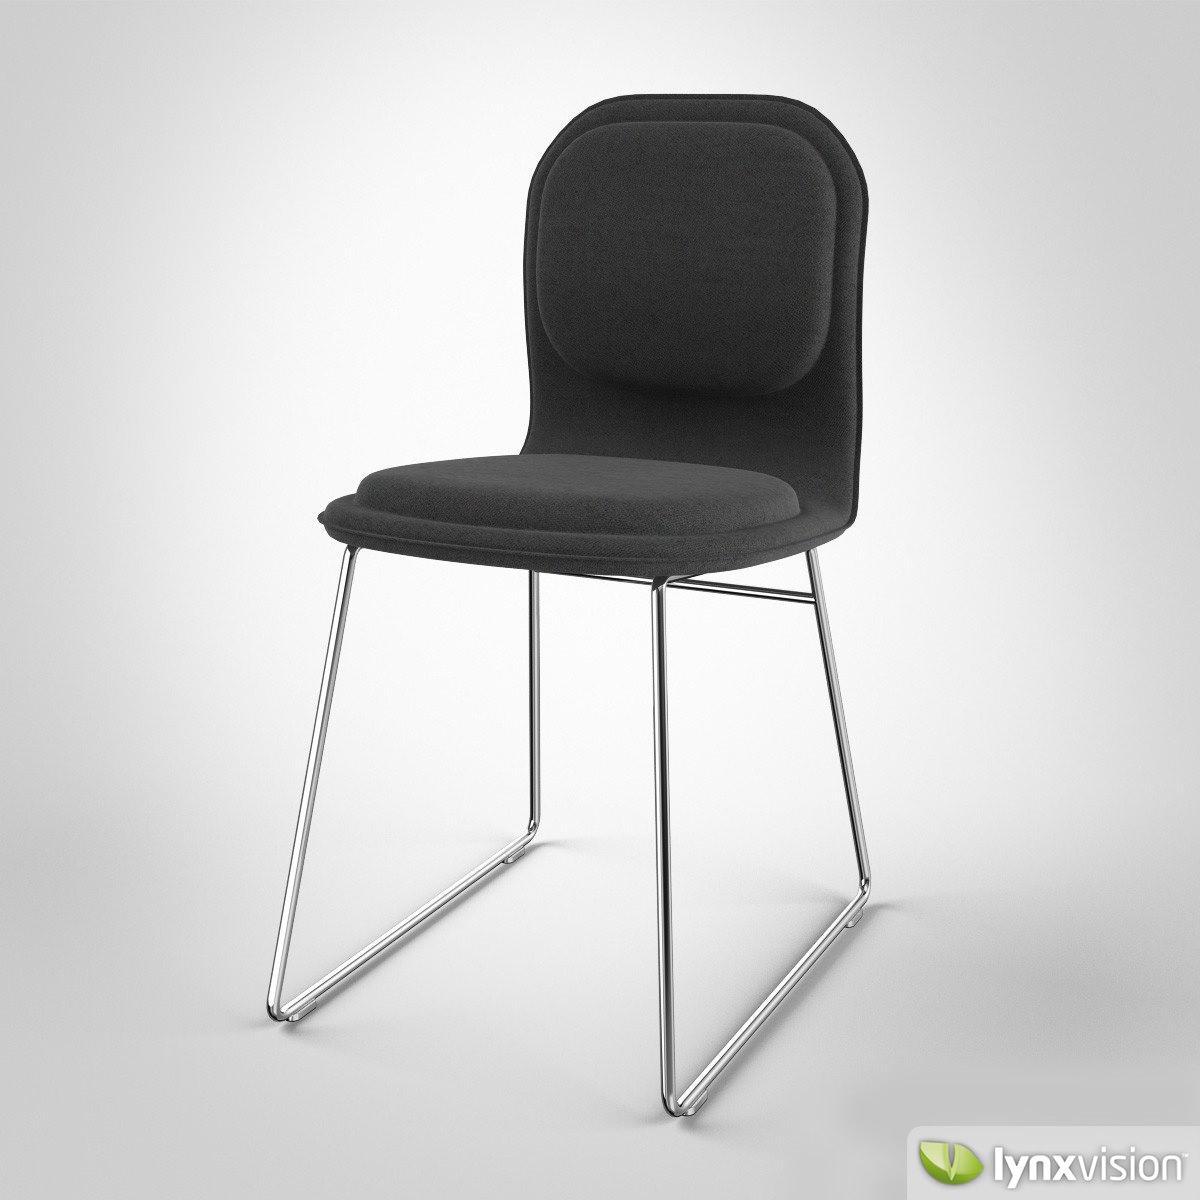 hi pad chair by jasper morrison 3d model max obj fbx mtl. Black Bedroom Furniture Sets. Home Design Ideas